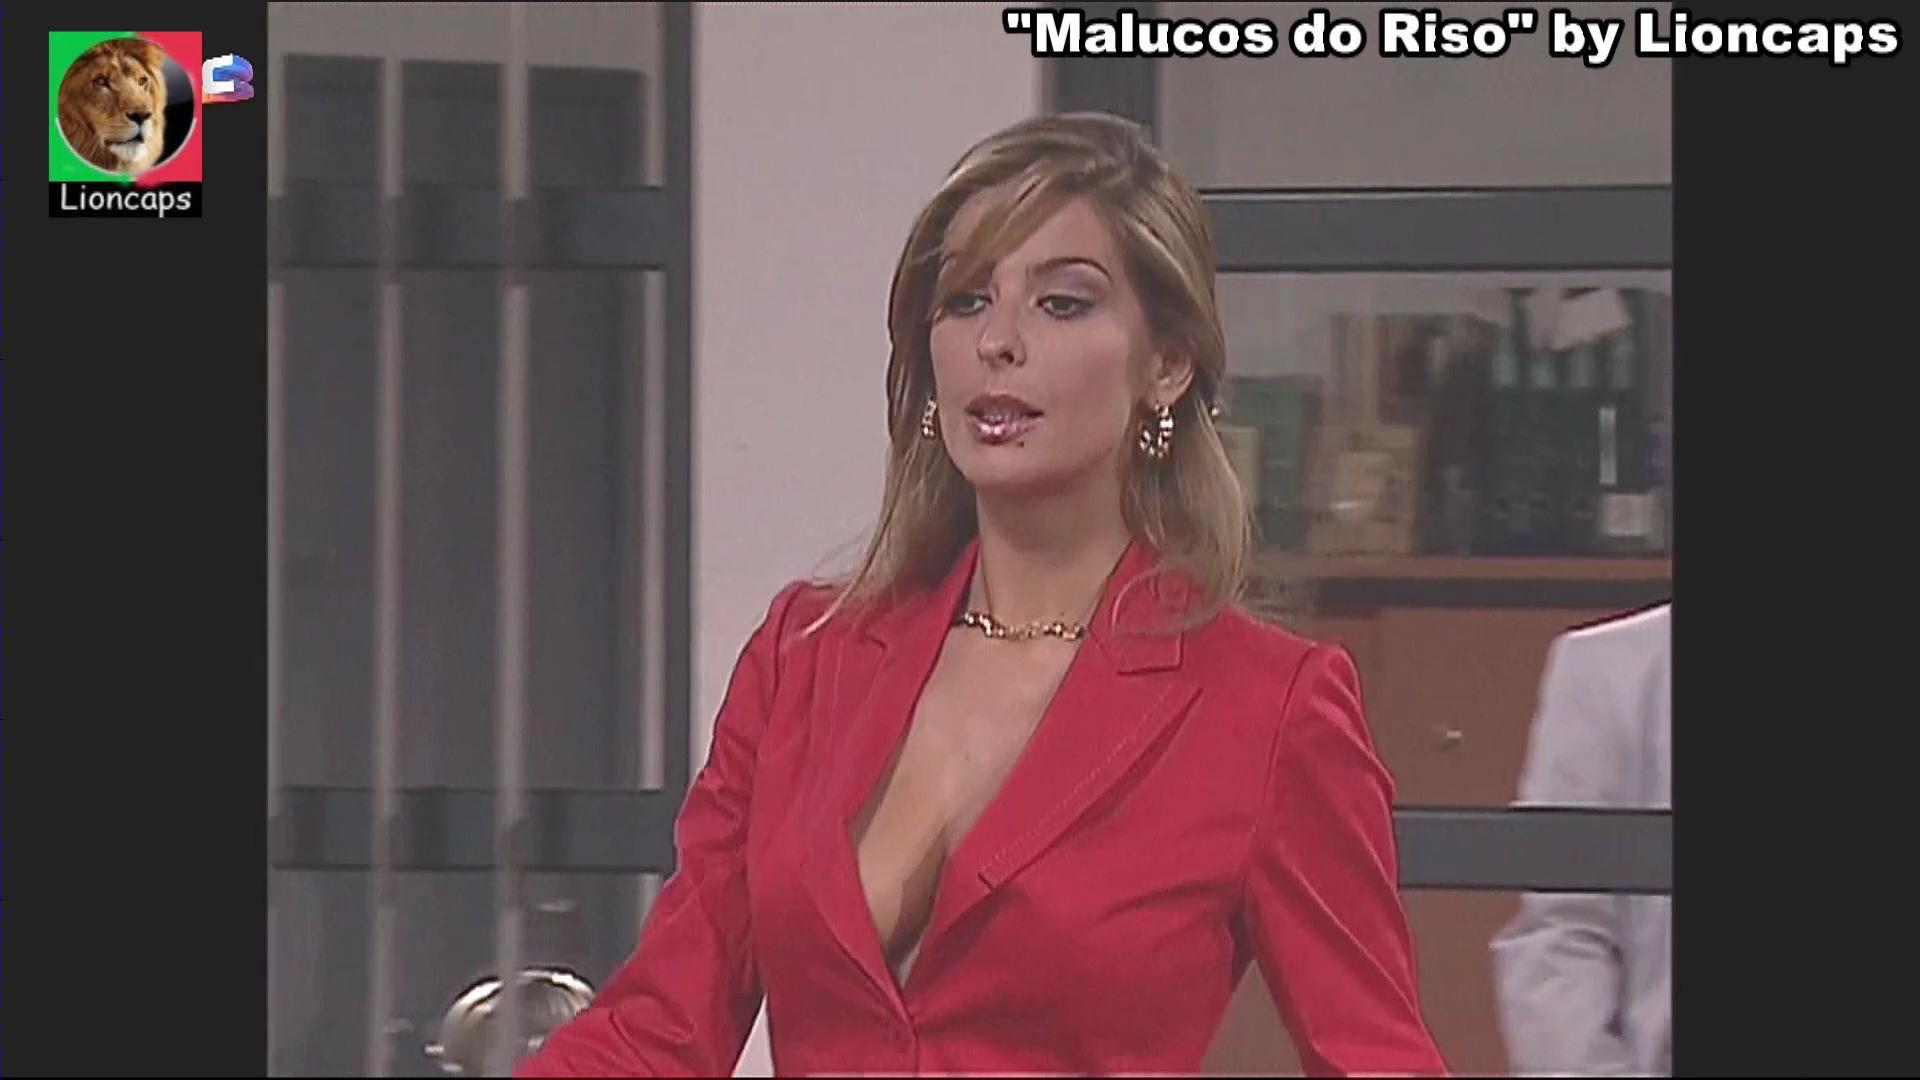 475171809_malucos_riso_alda_gomes_vs190malucos_riso_602_15077_122_172lo.JPG